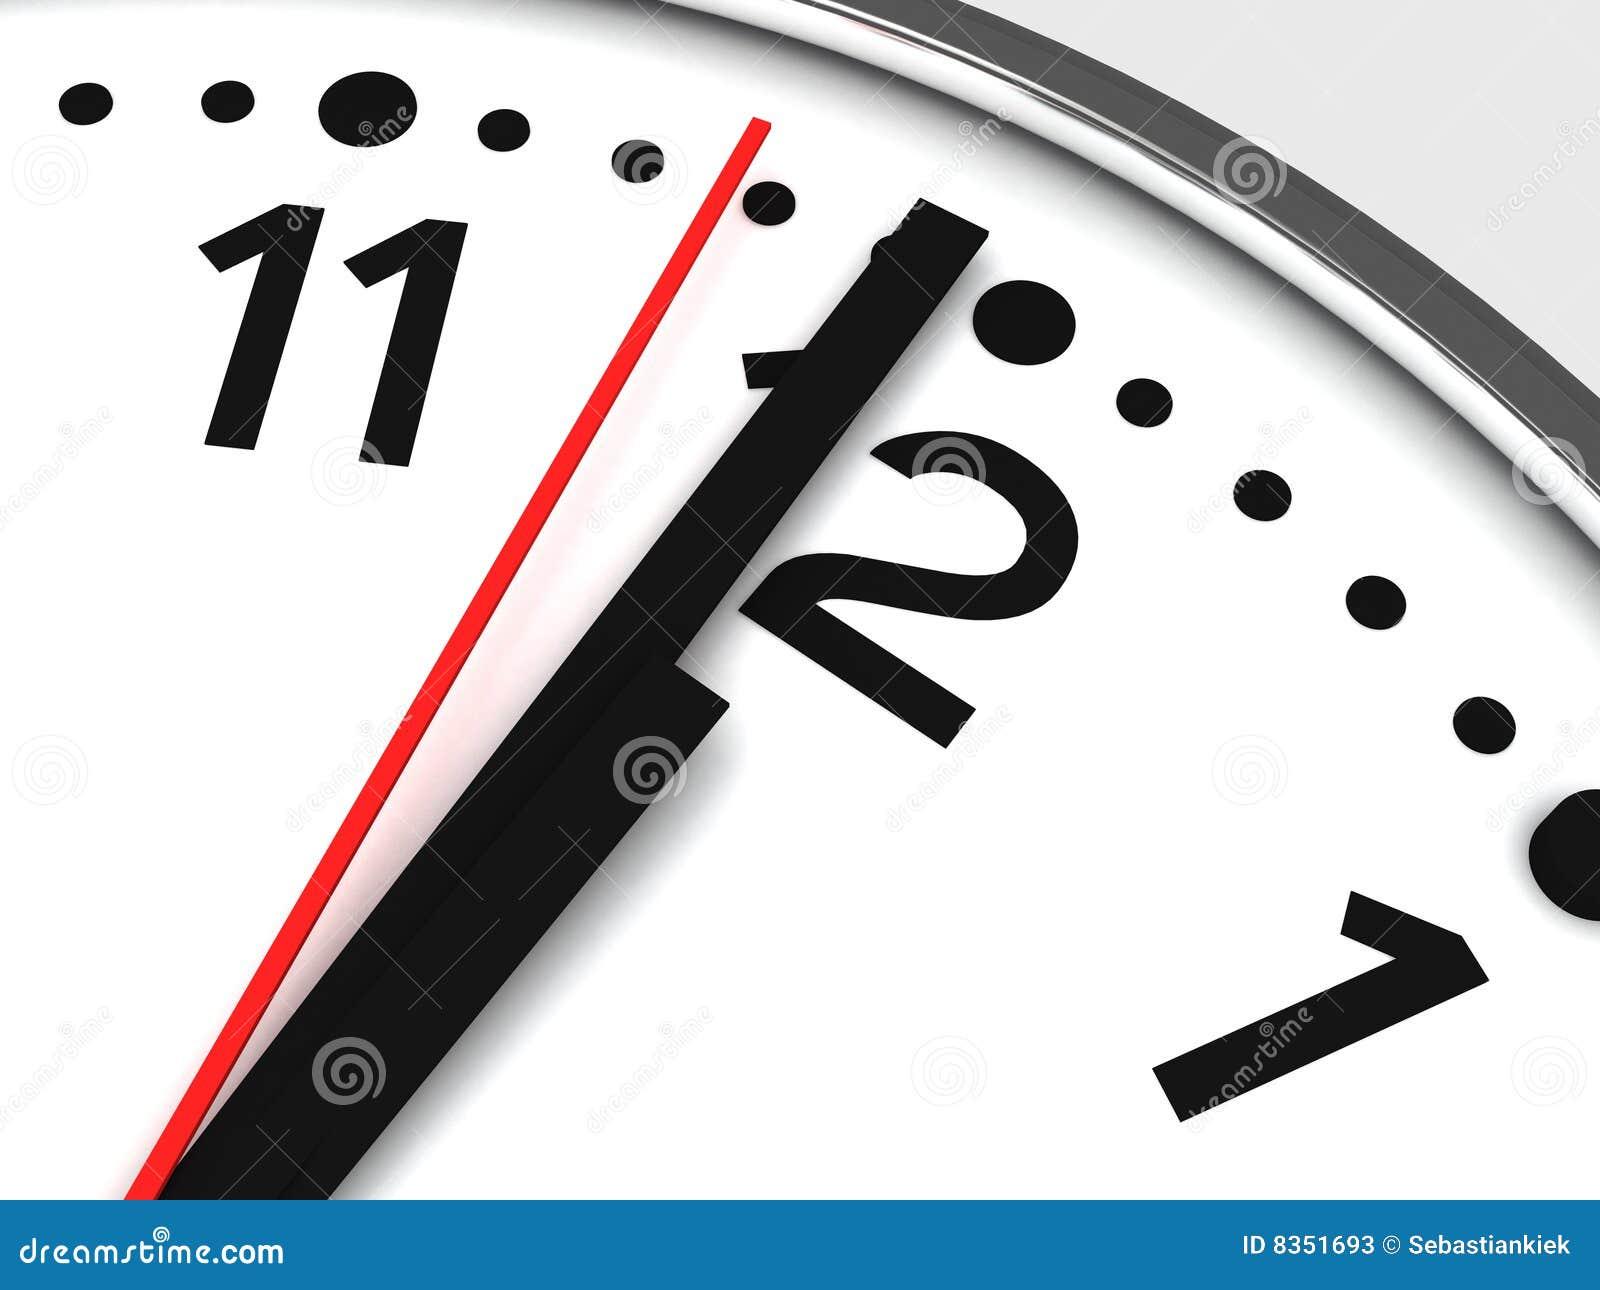 analog clock closeup stock photos image 8351693. Black Bedroom Furniture Sets. Home Design Ideas